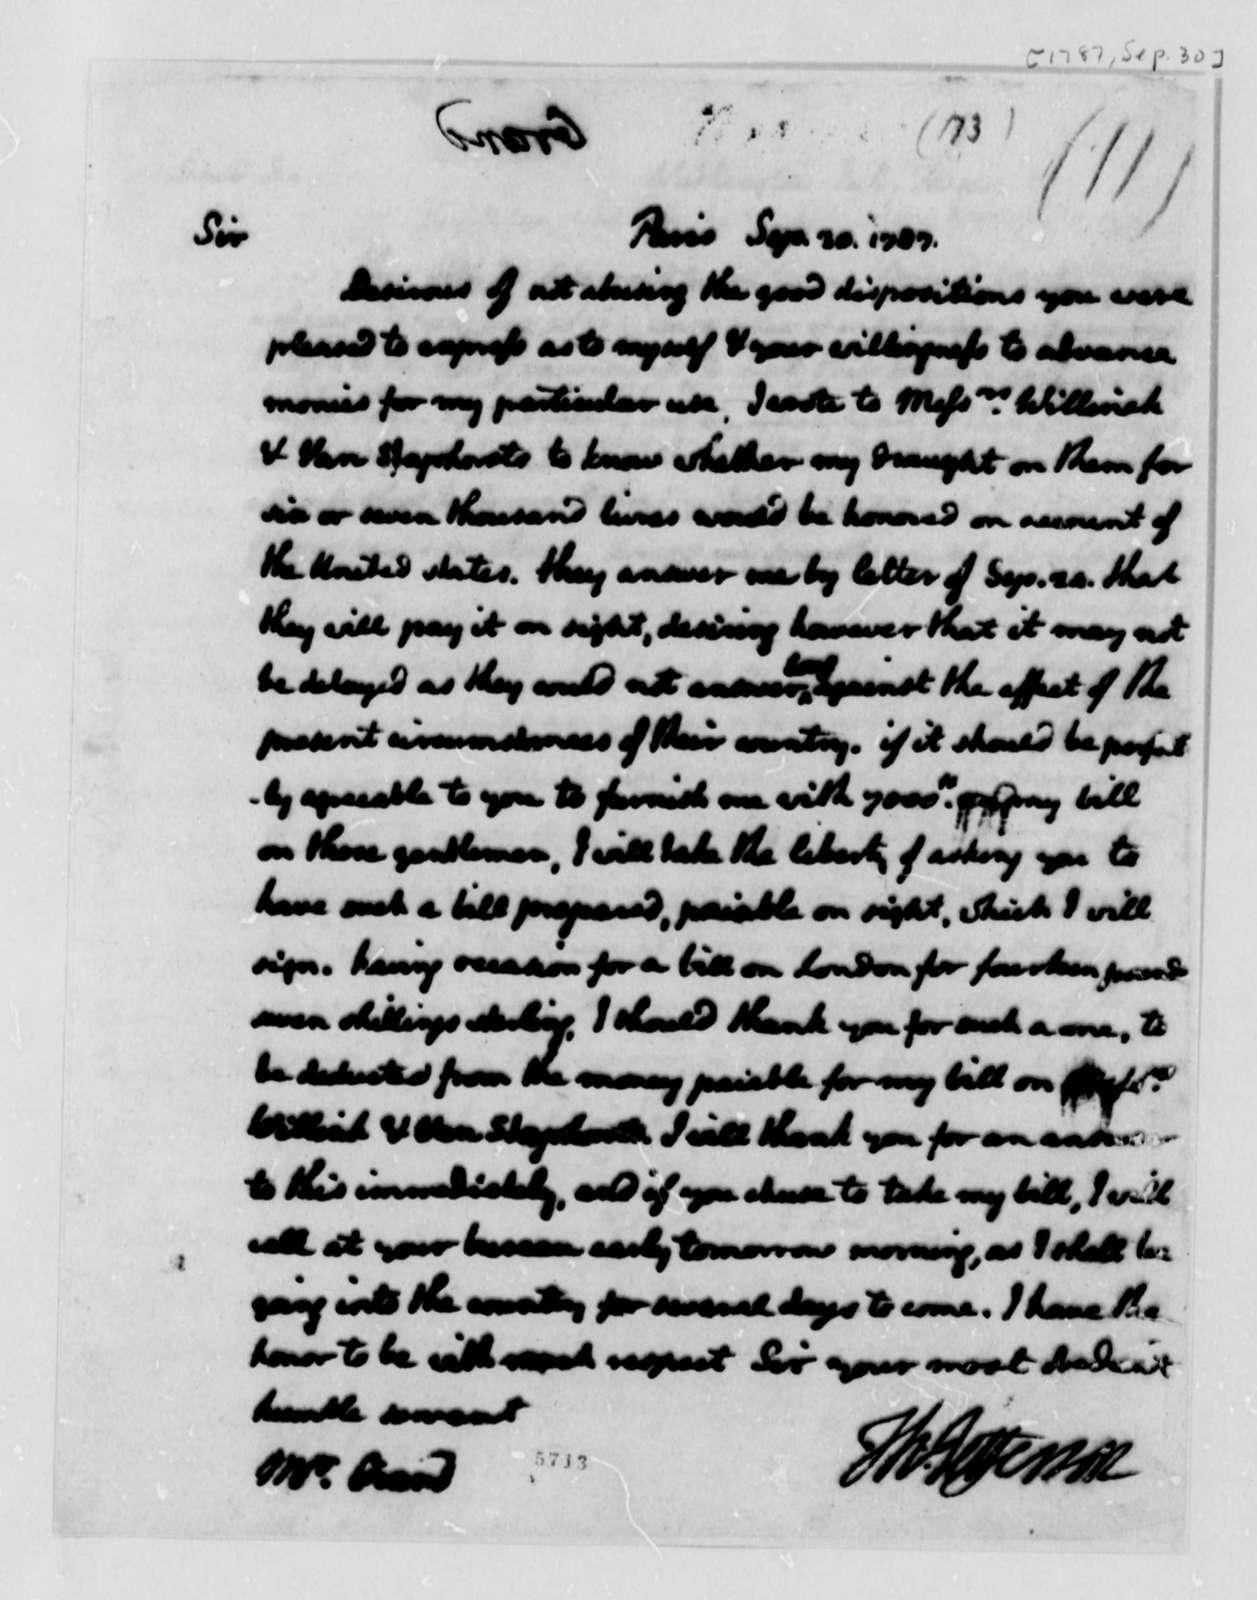 Thomas Jefferson to Ferdinand Grand, September 30, 1787